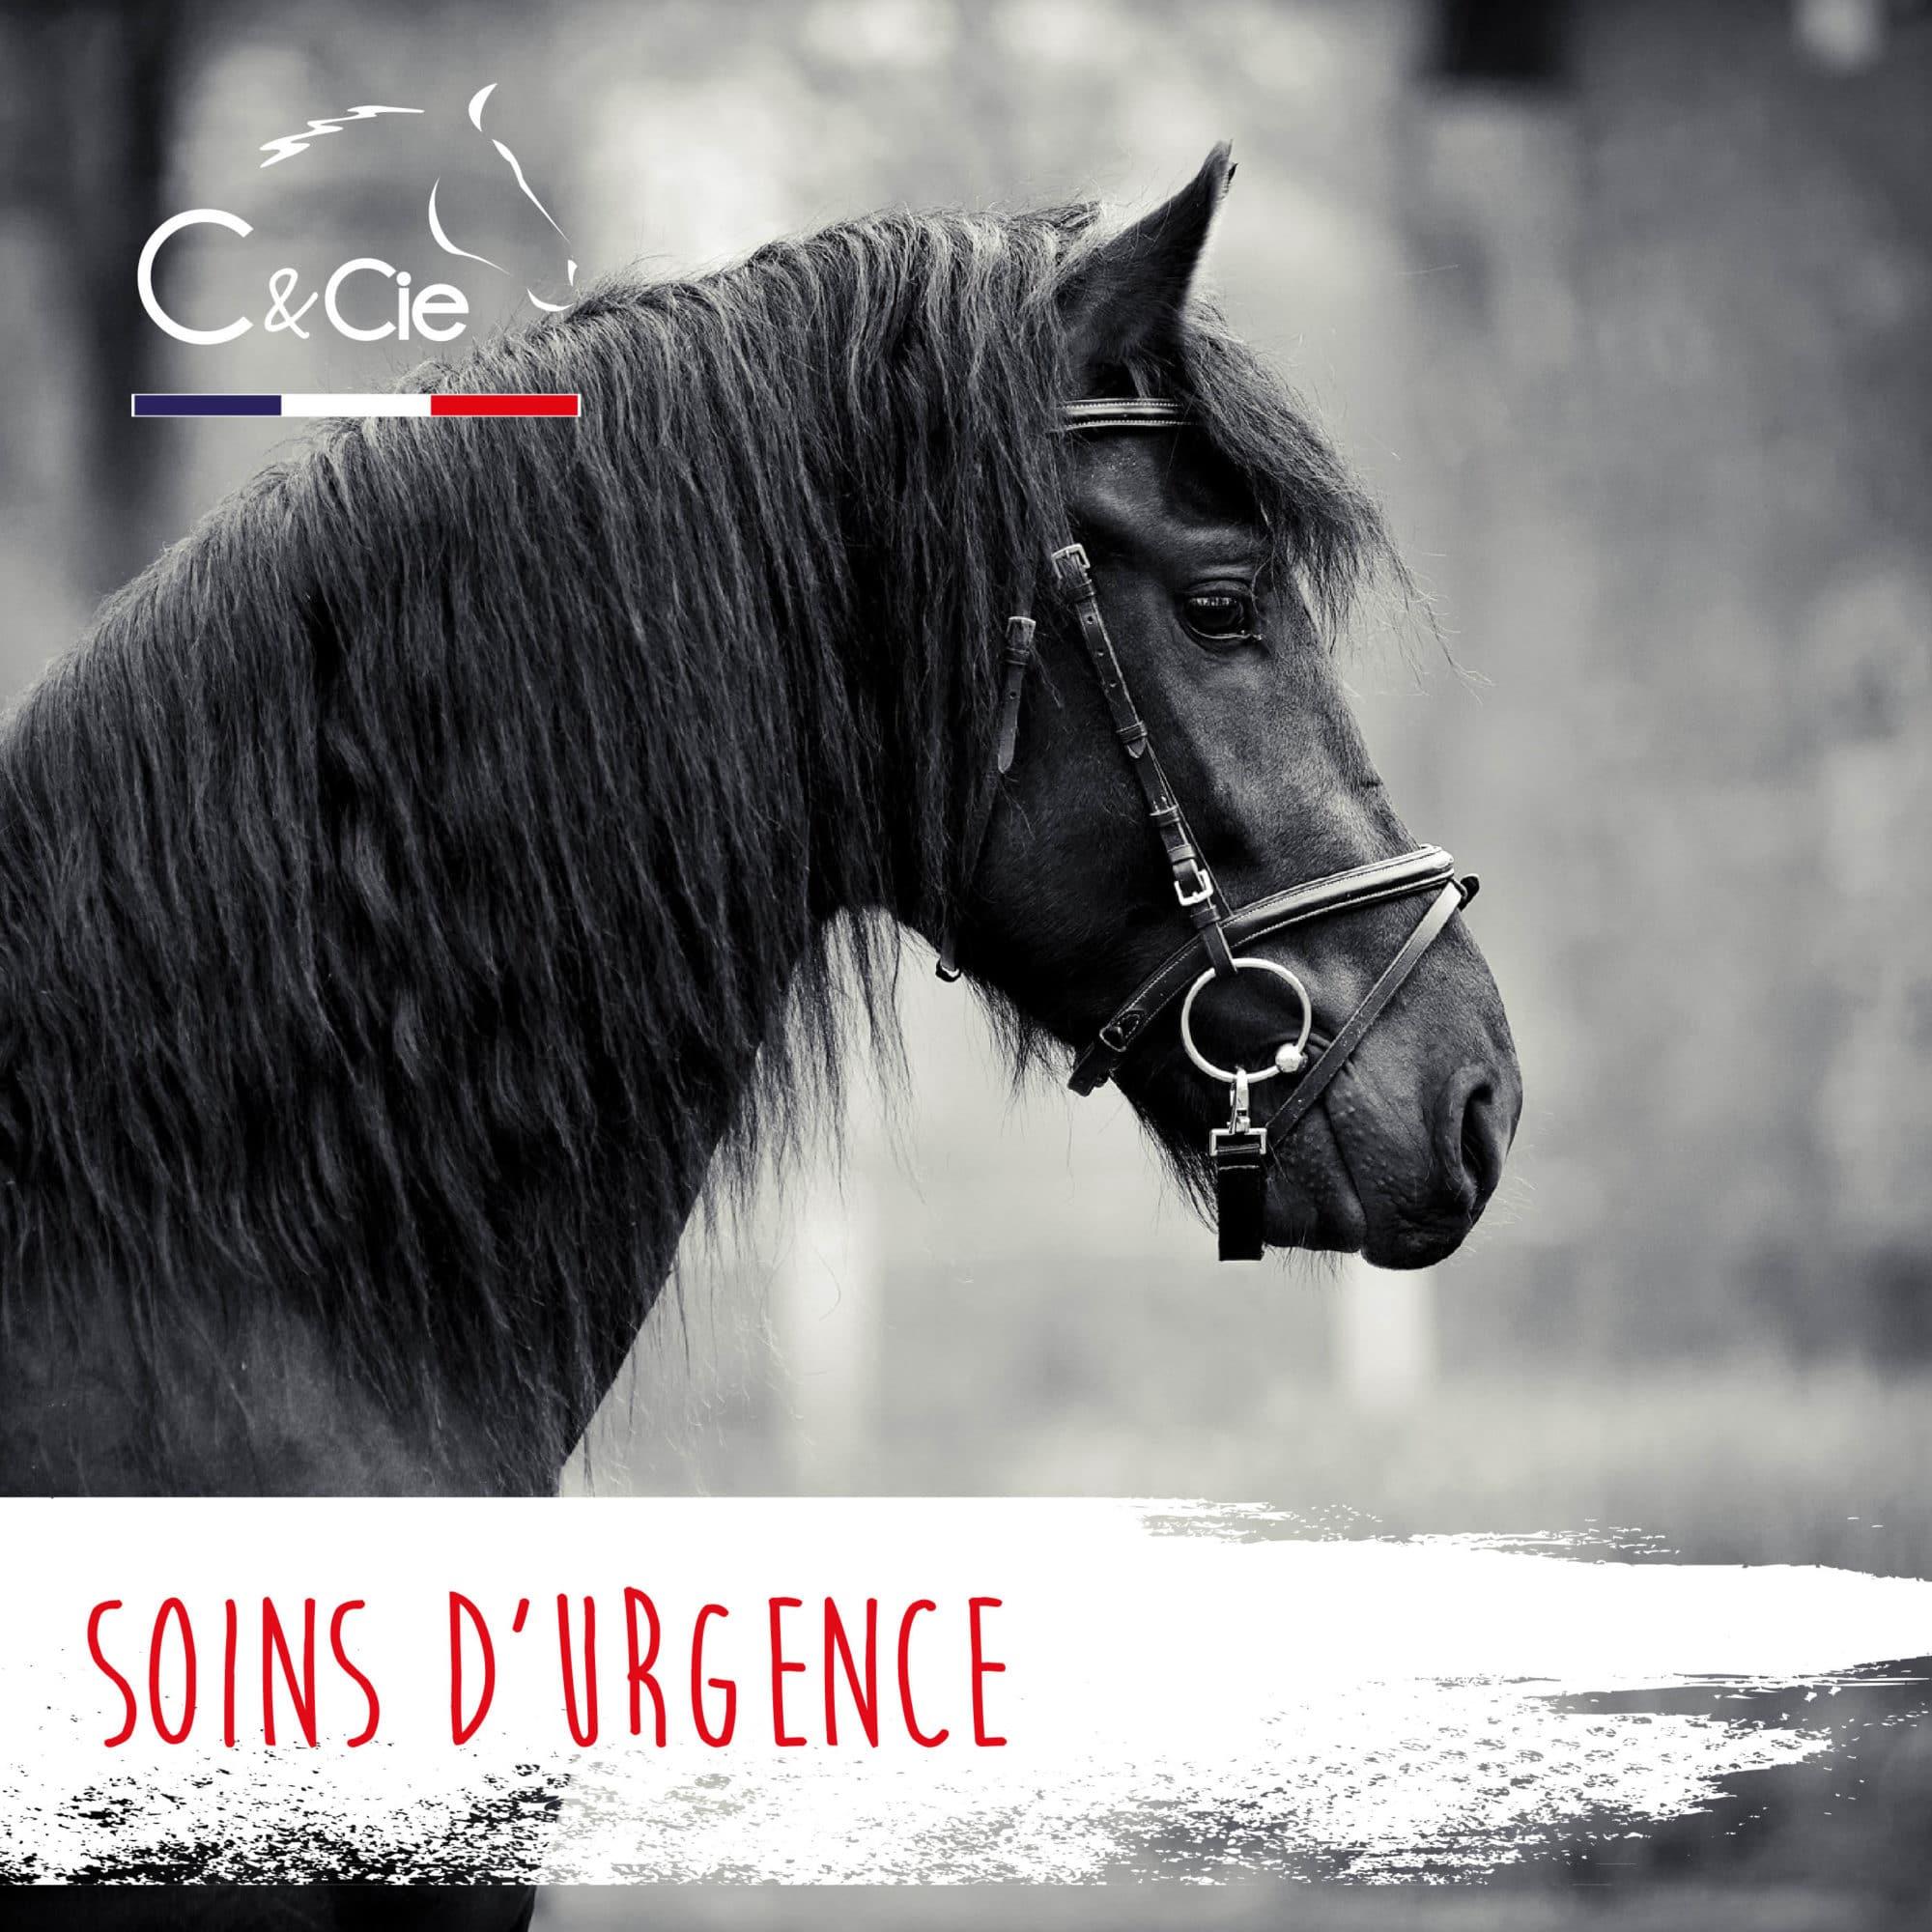 soigner cheval au naturel aromatherapie huile essentielles réparateur cutane blessure